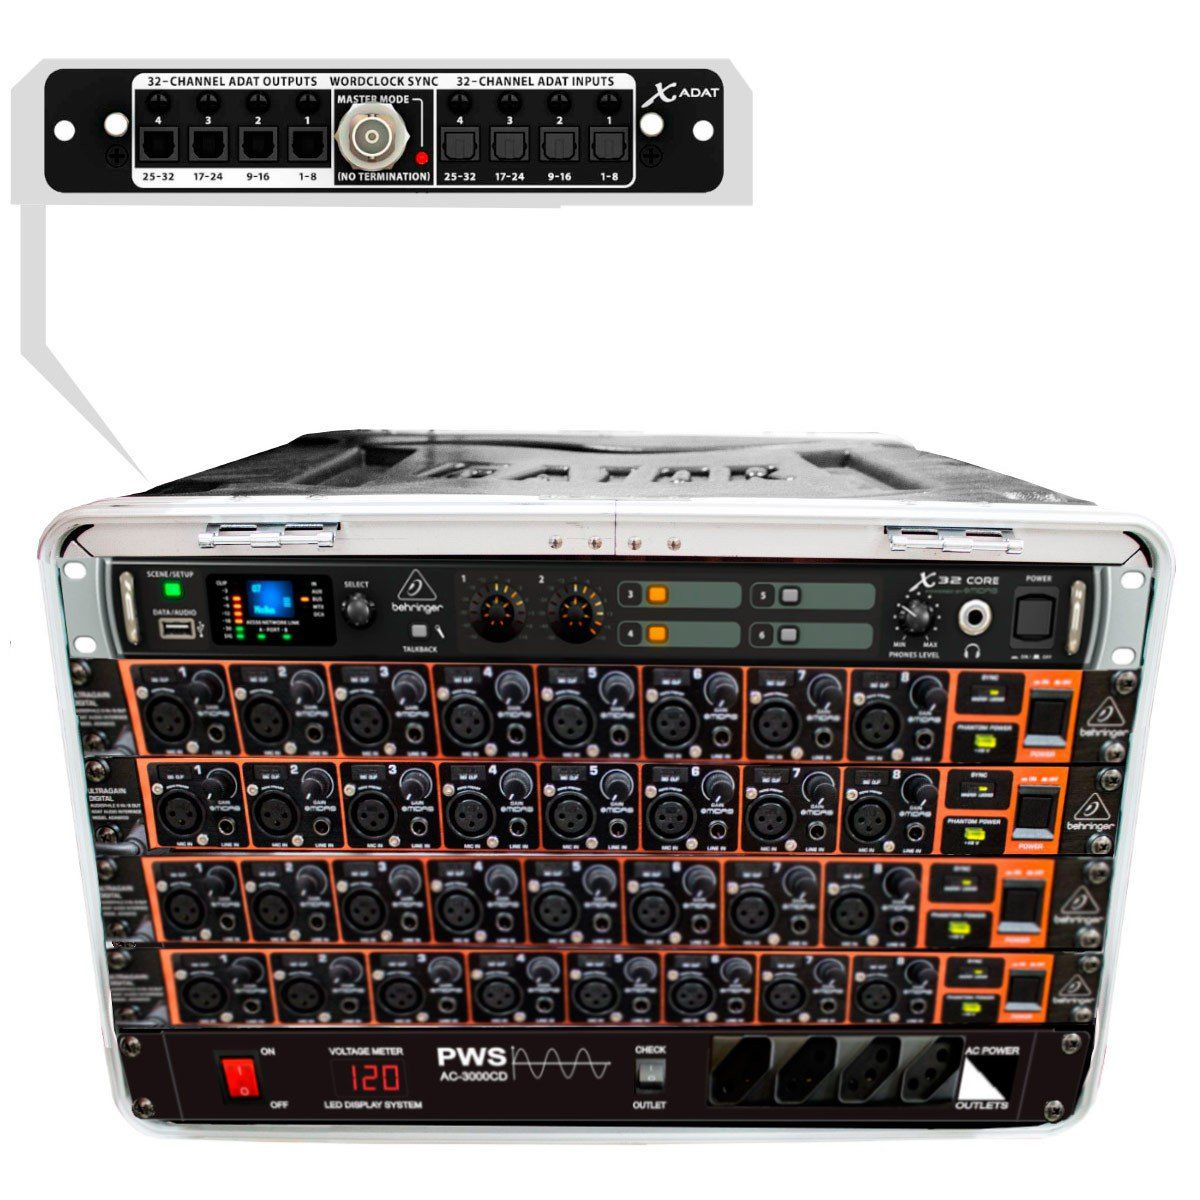 Mesa digital 32 Canais X32 Core 32MK Modular Compacta Portátil c/ Case